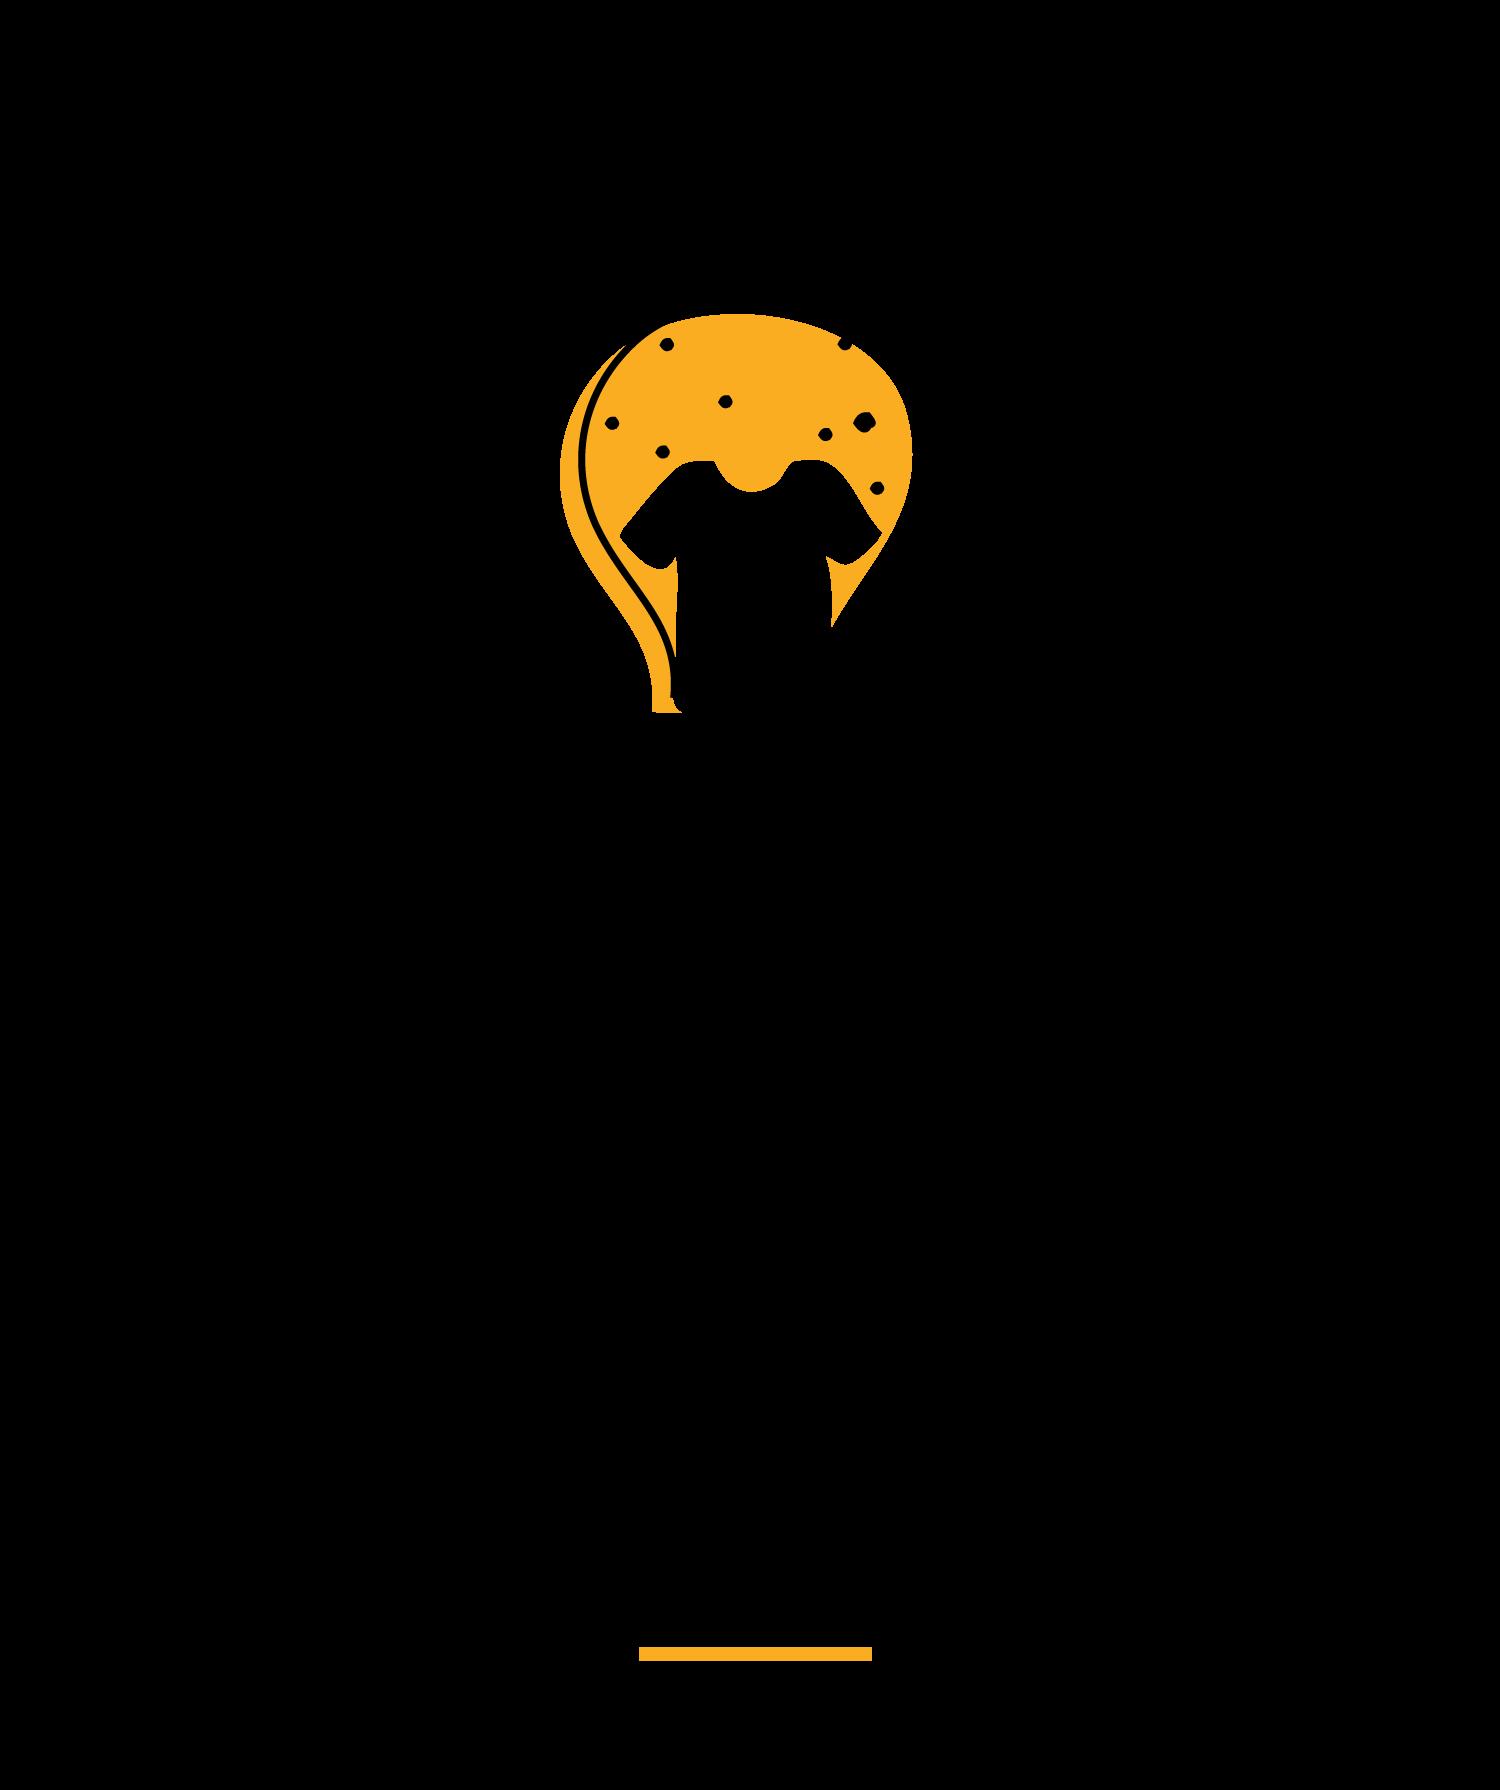 Design a fun logo for a T-Shirt company